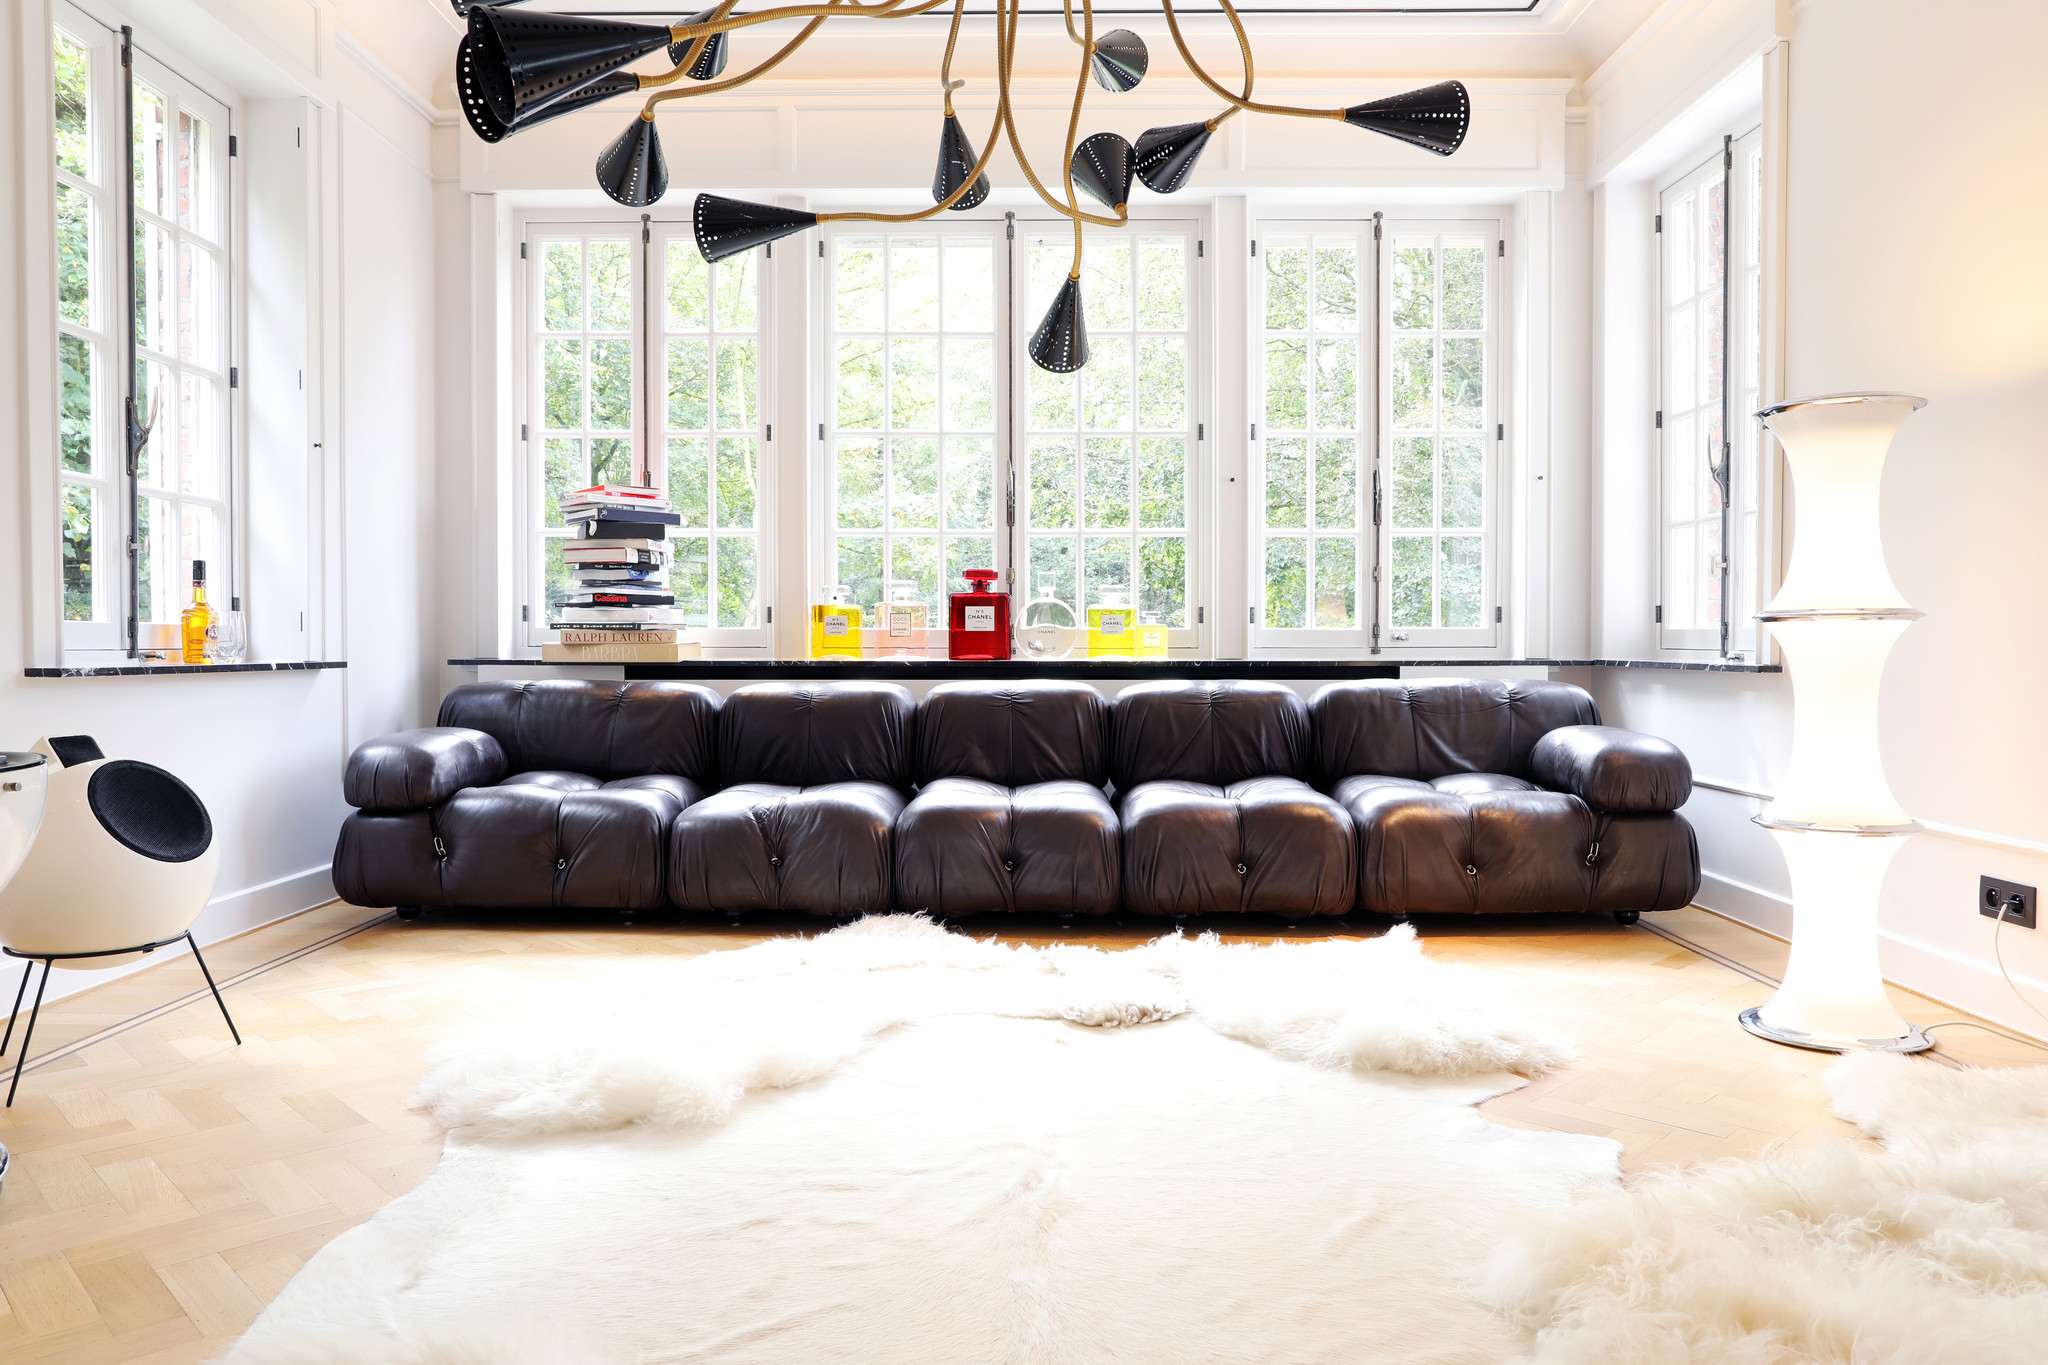 Vintage Camaleonda sofa designed by Mario Bellini for B&B Italia, 1971